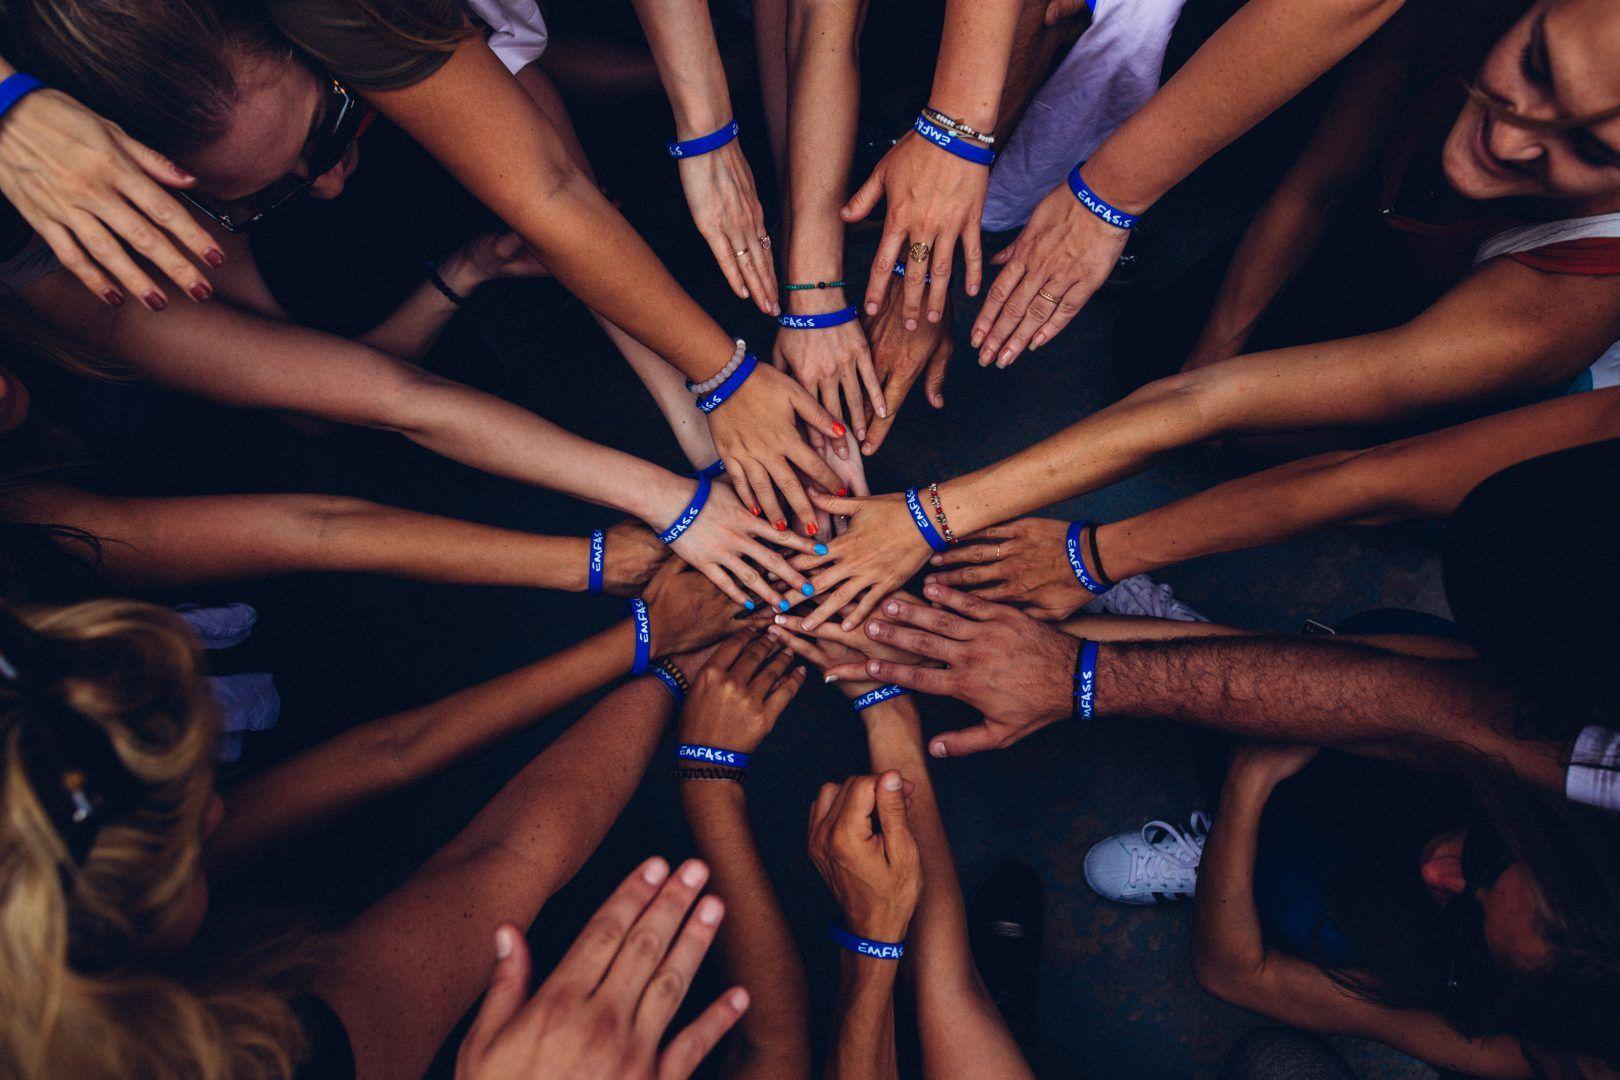 7 - Charities social